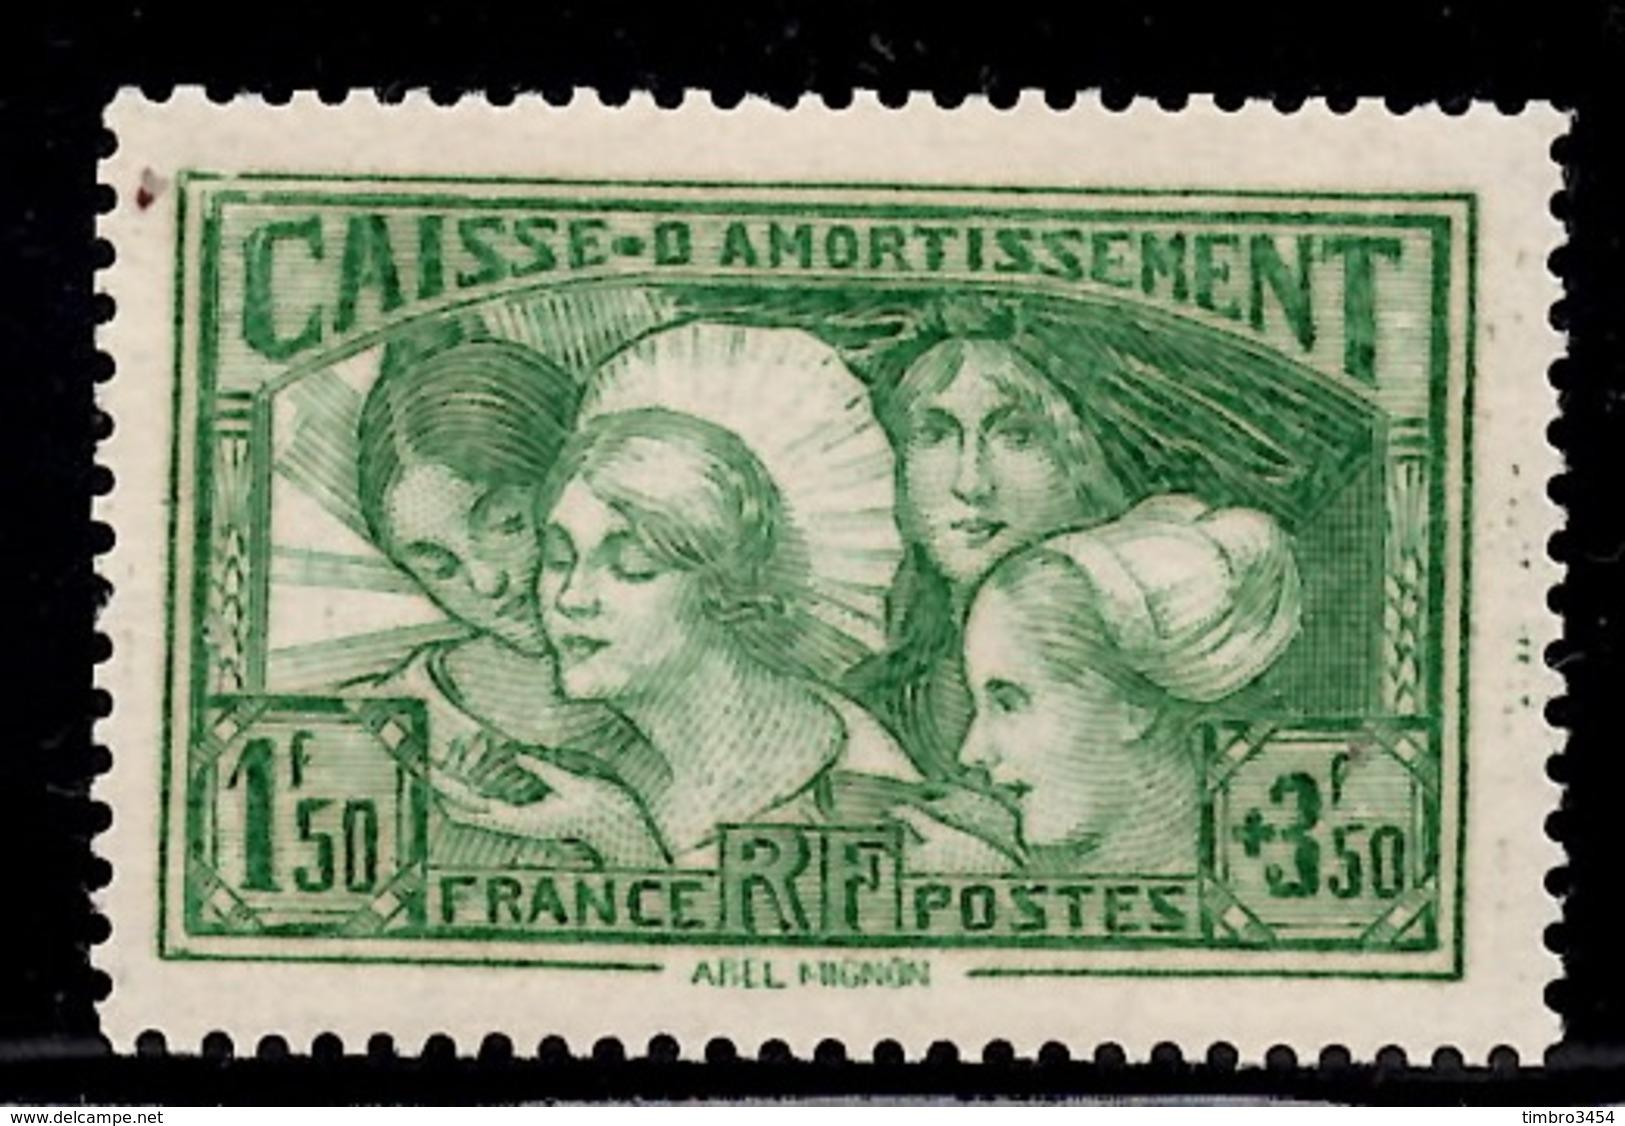 France Les Provinces YT N° 269 Neuf *. Gomme D'origine. B/TB. A Saisir! - France